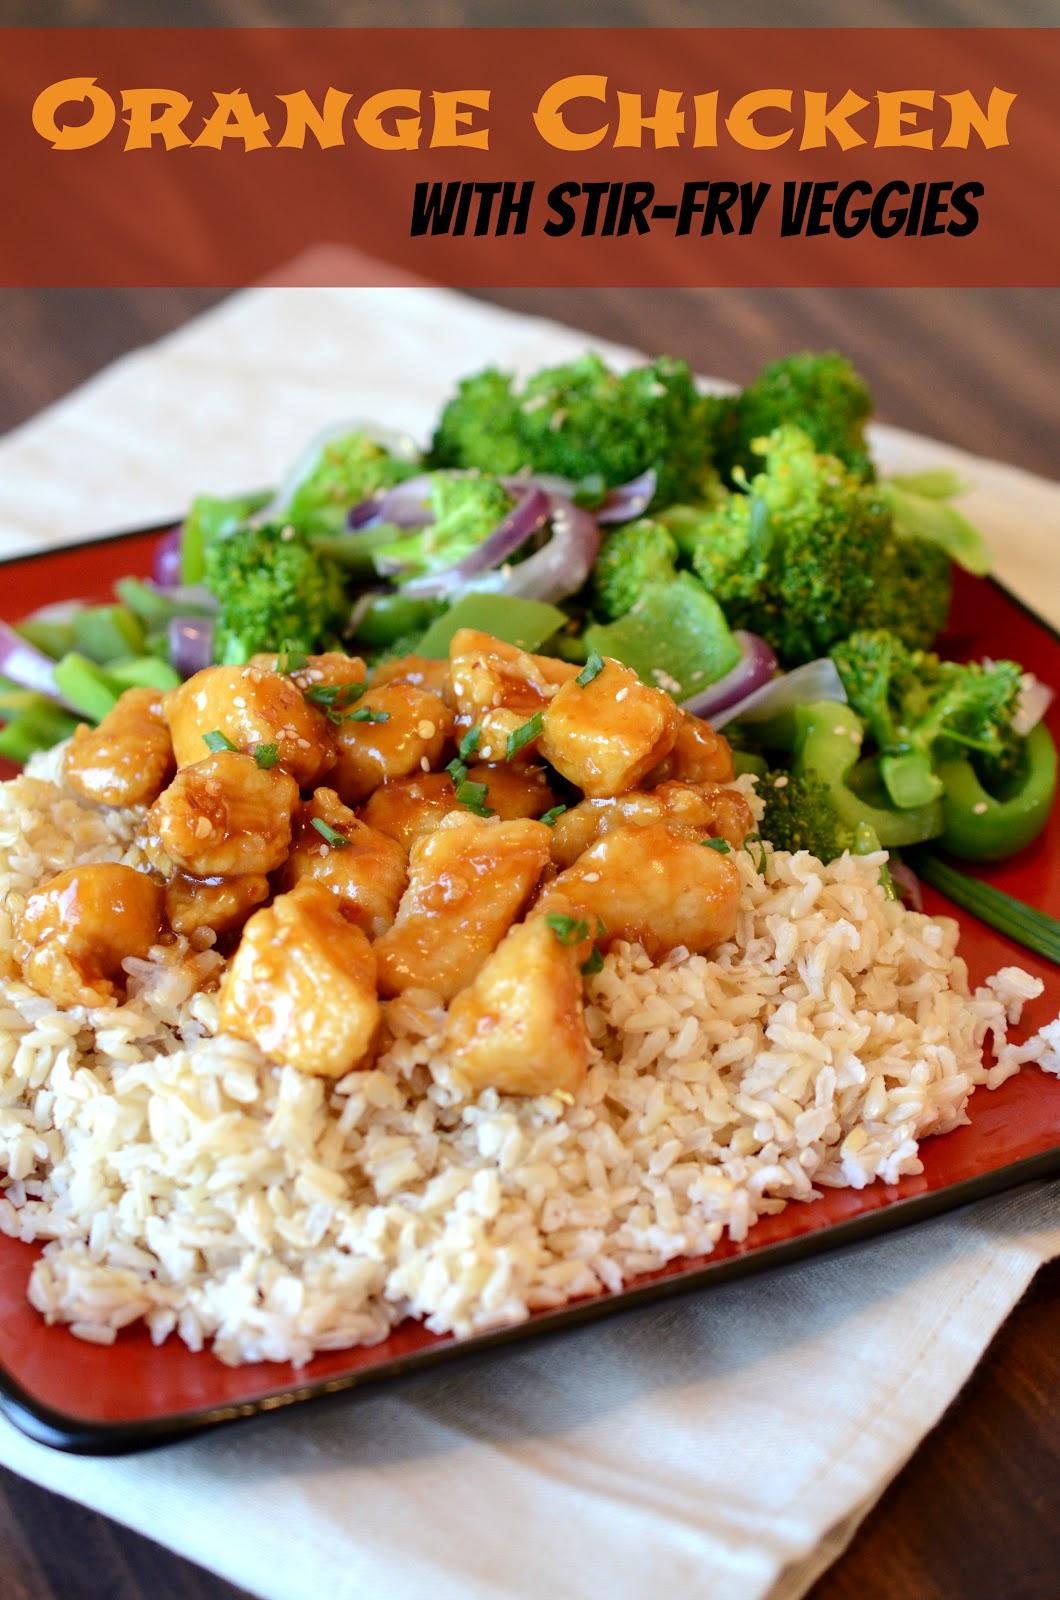 Orange chicken with white rice recipe